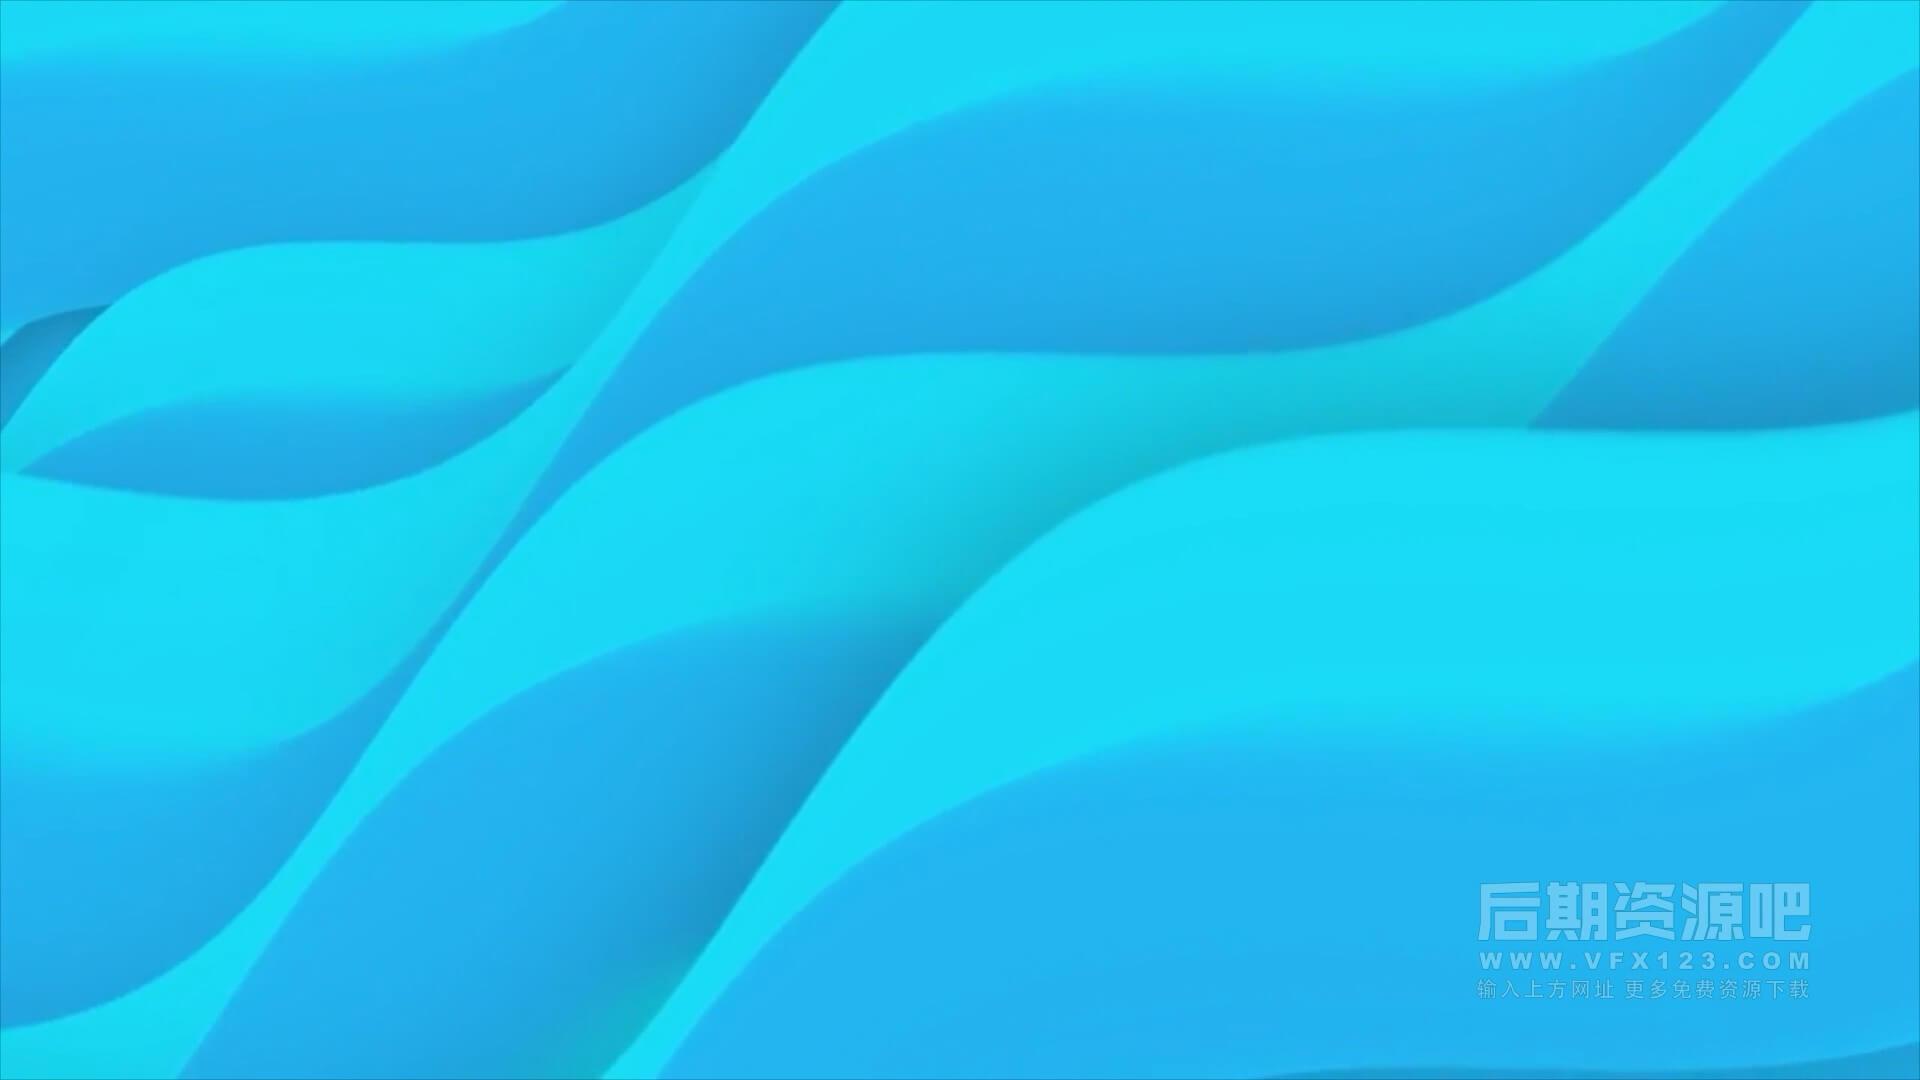 fcpx插件 17组绚丽动态背景素材 可自定义颜色 Backgrounds